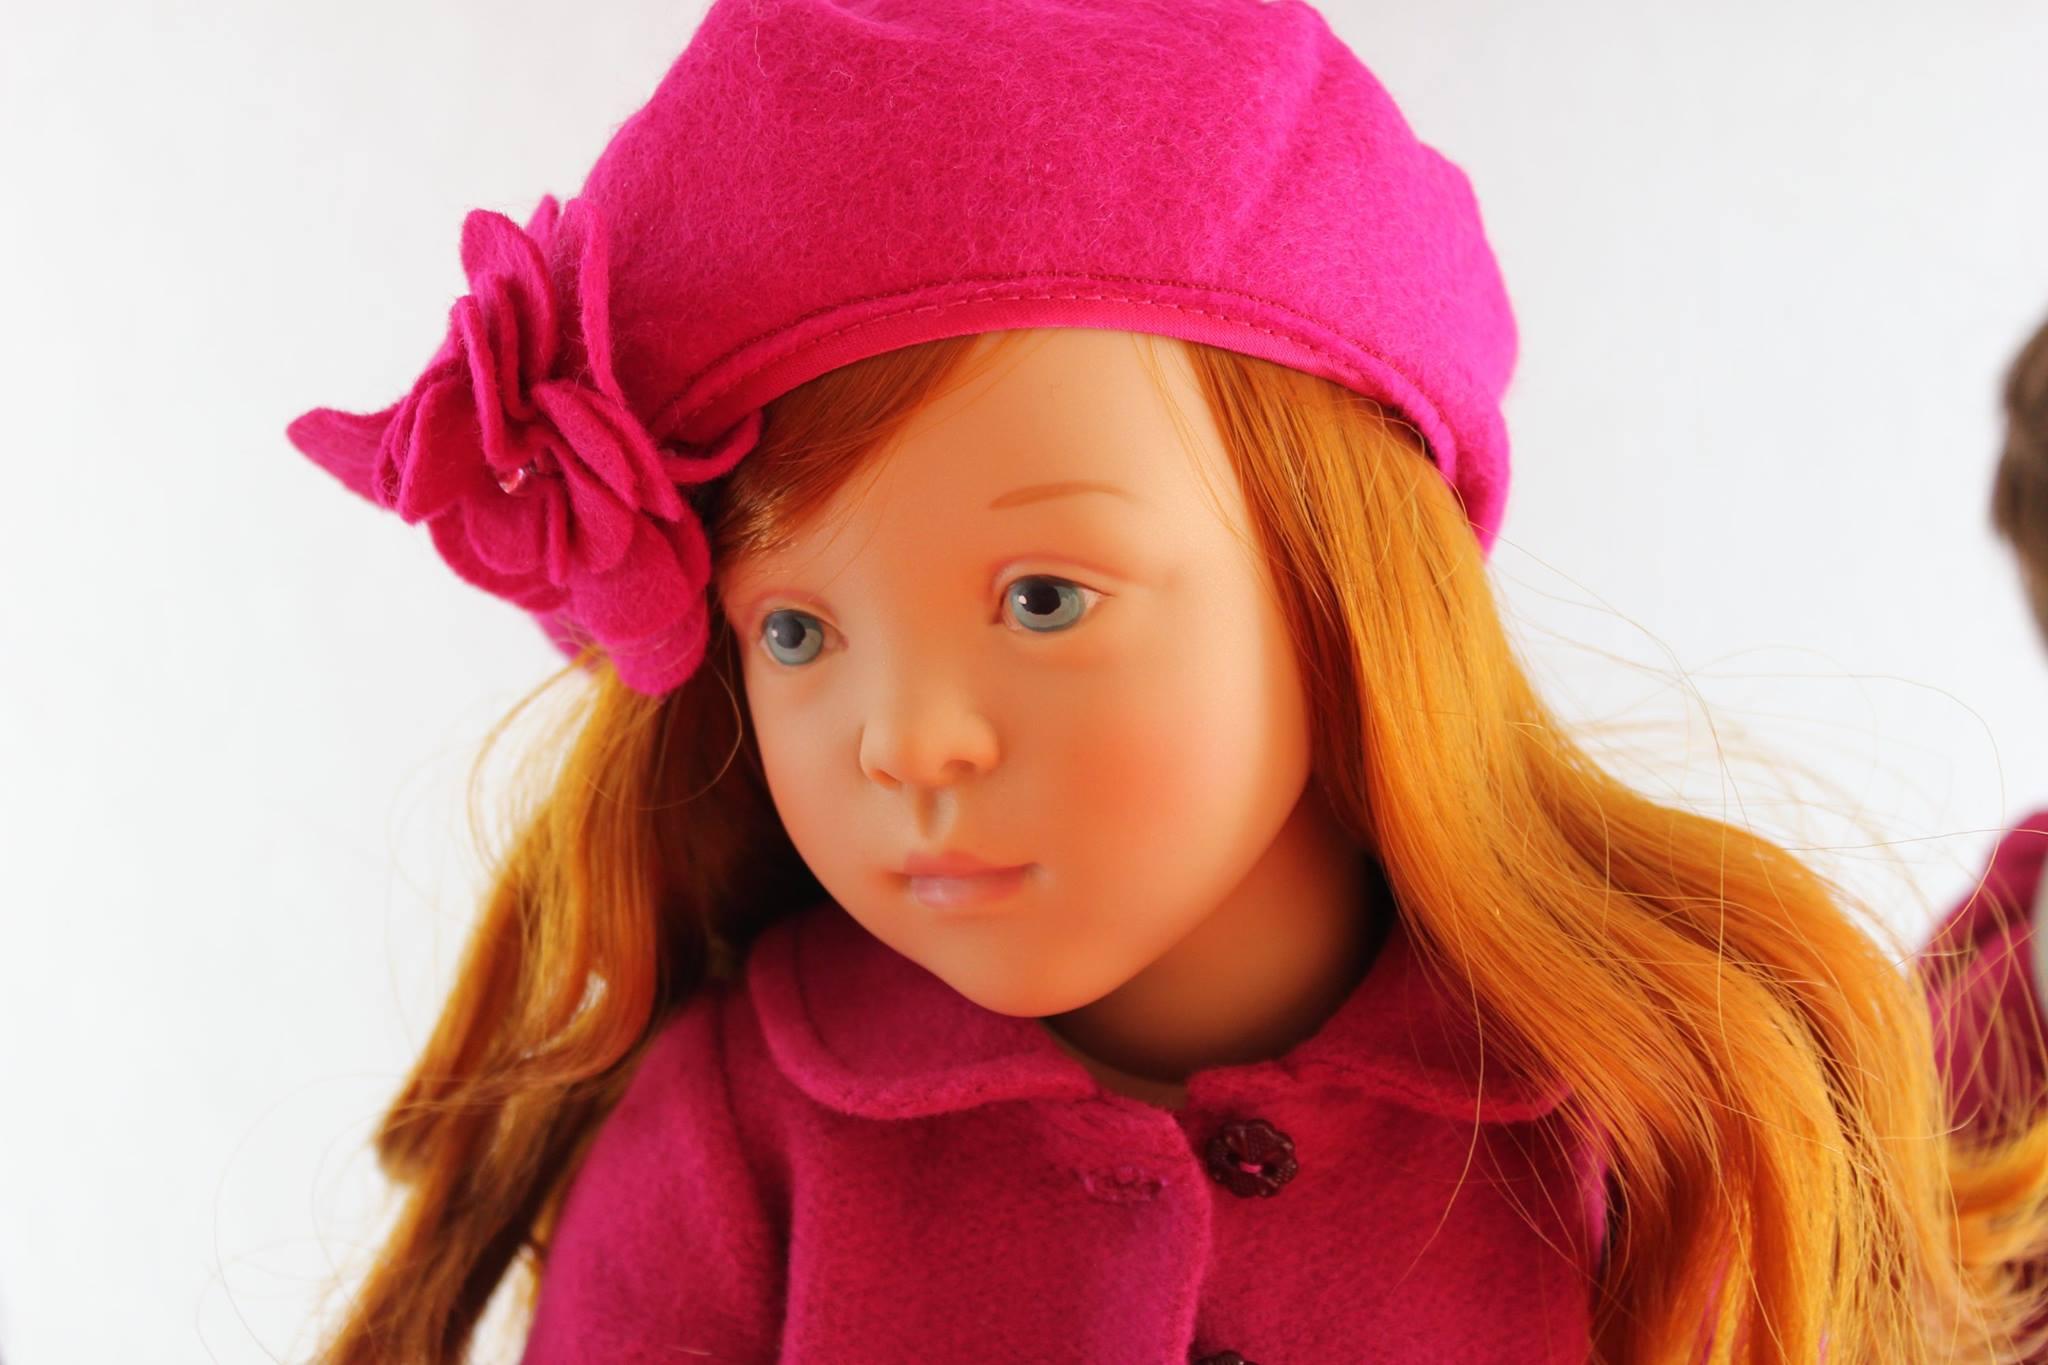 A Finouche doll